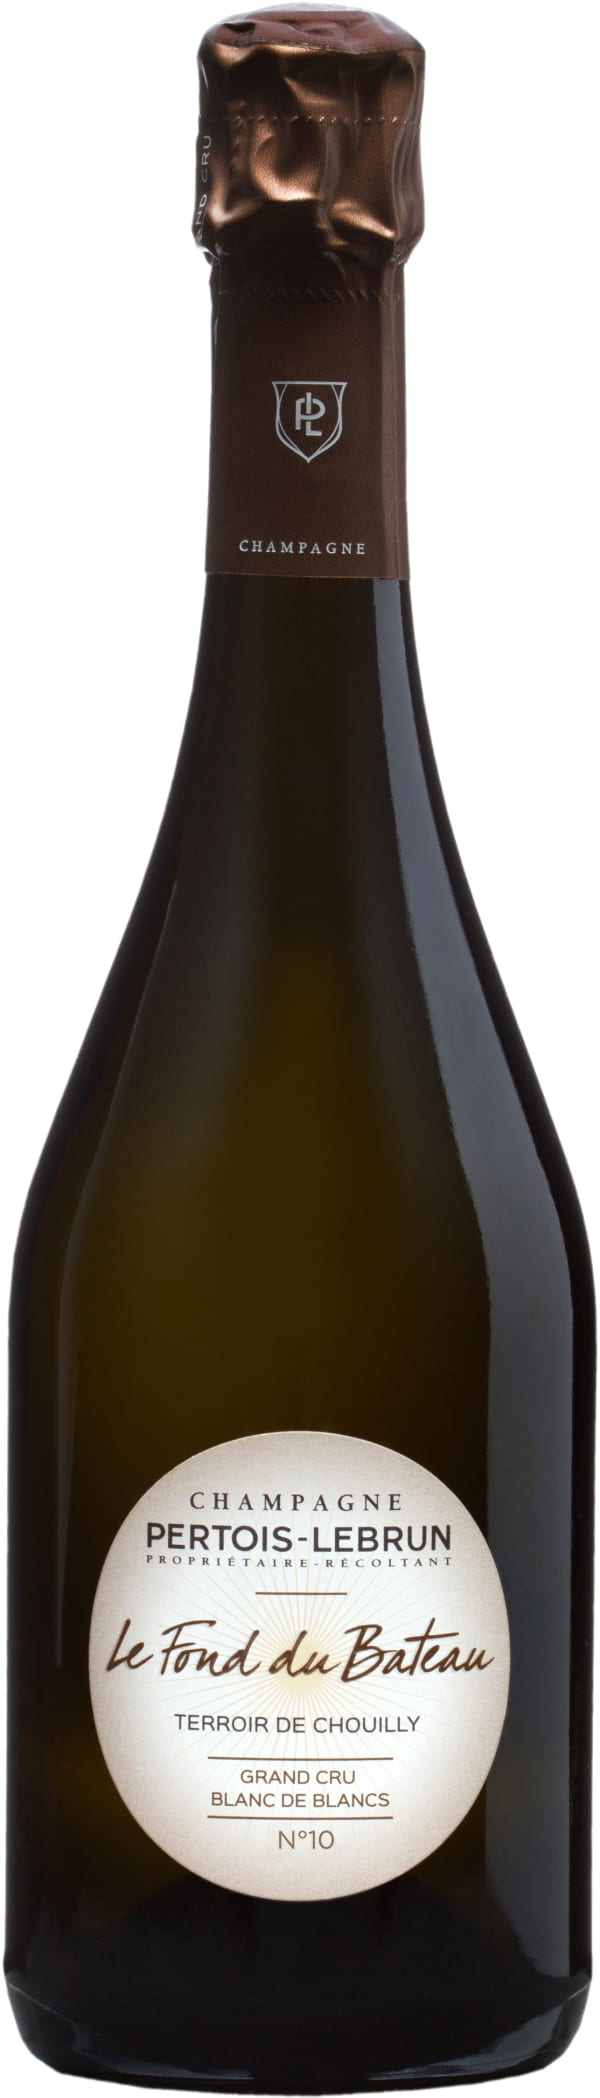 Pertois-Lebrun Le Fond du Bateau Grand Cru Blanc de Blancs Champagne Extra-Brut 2010